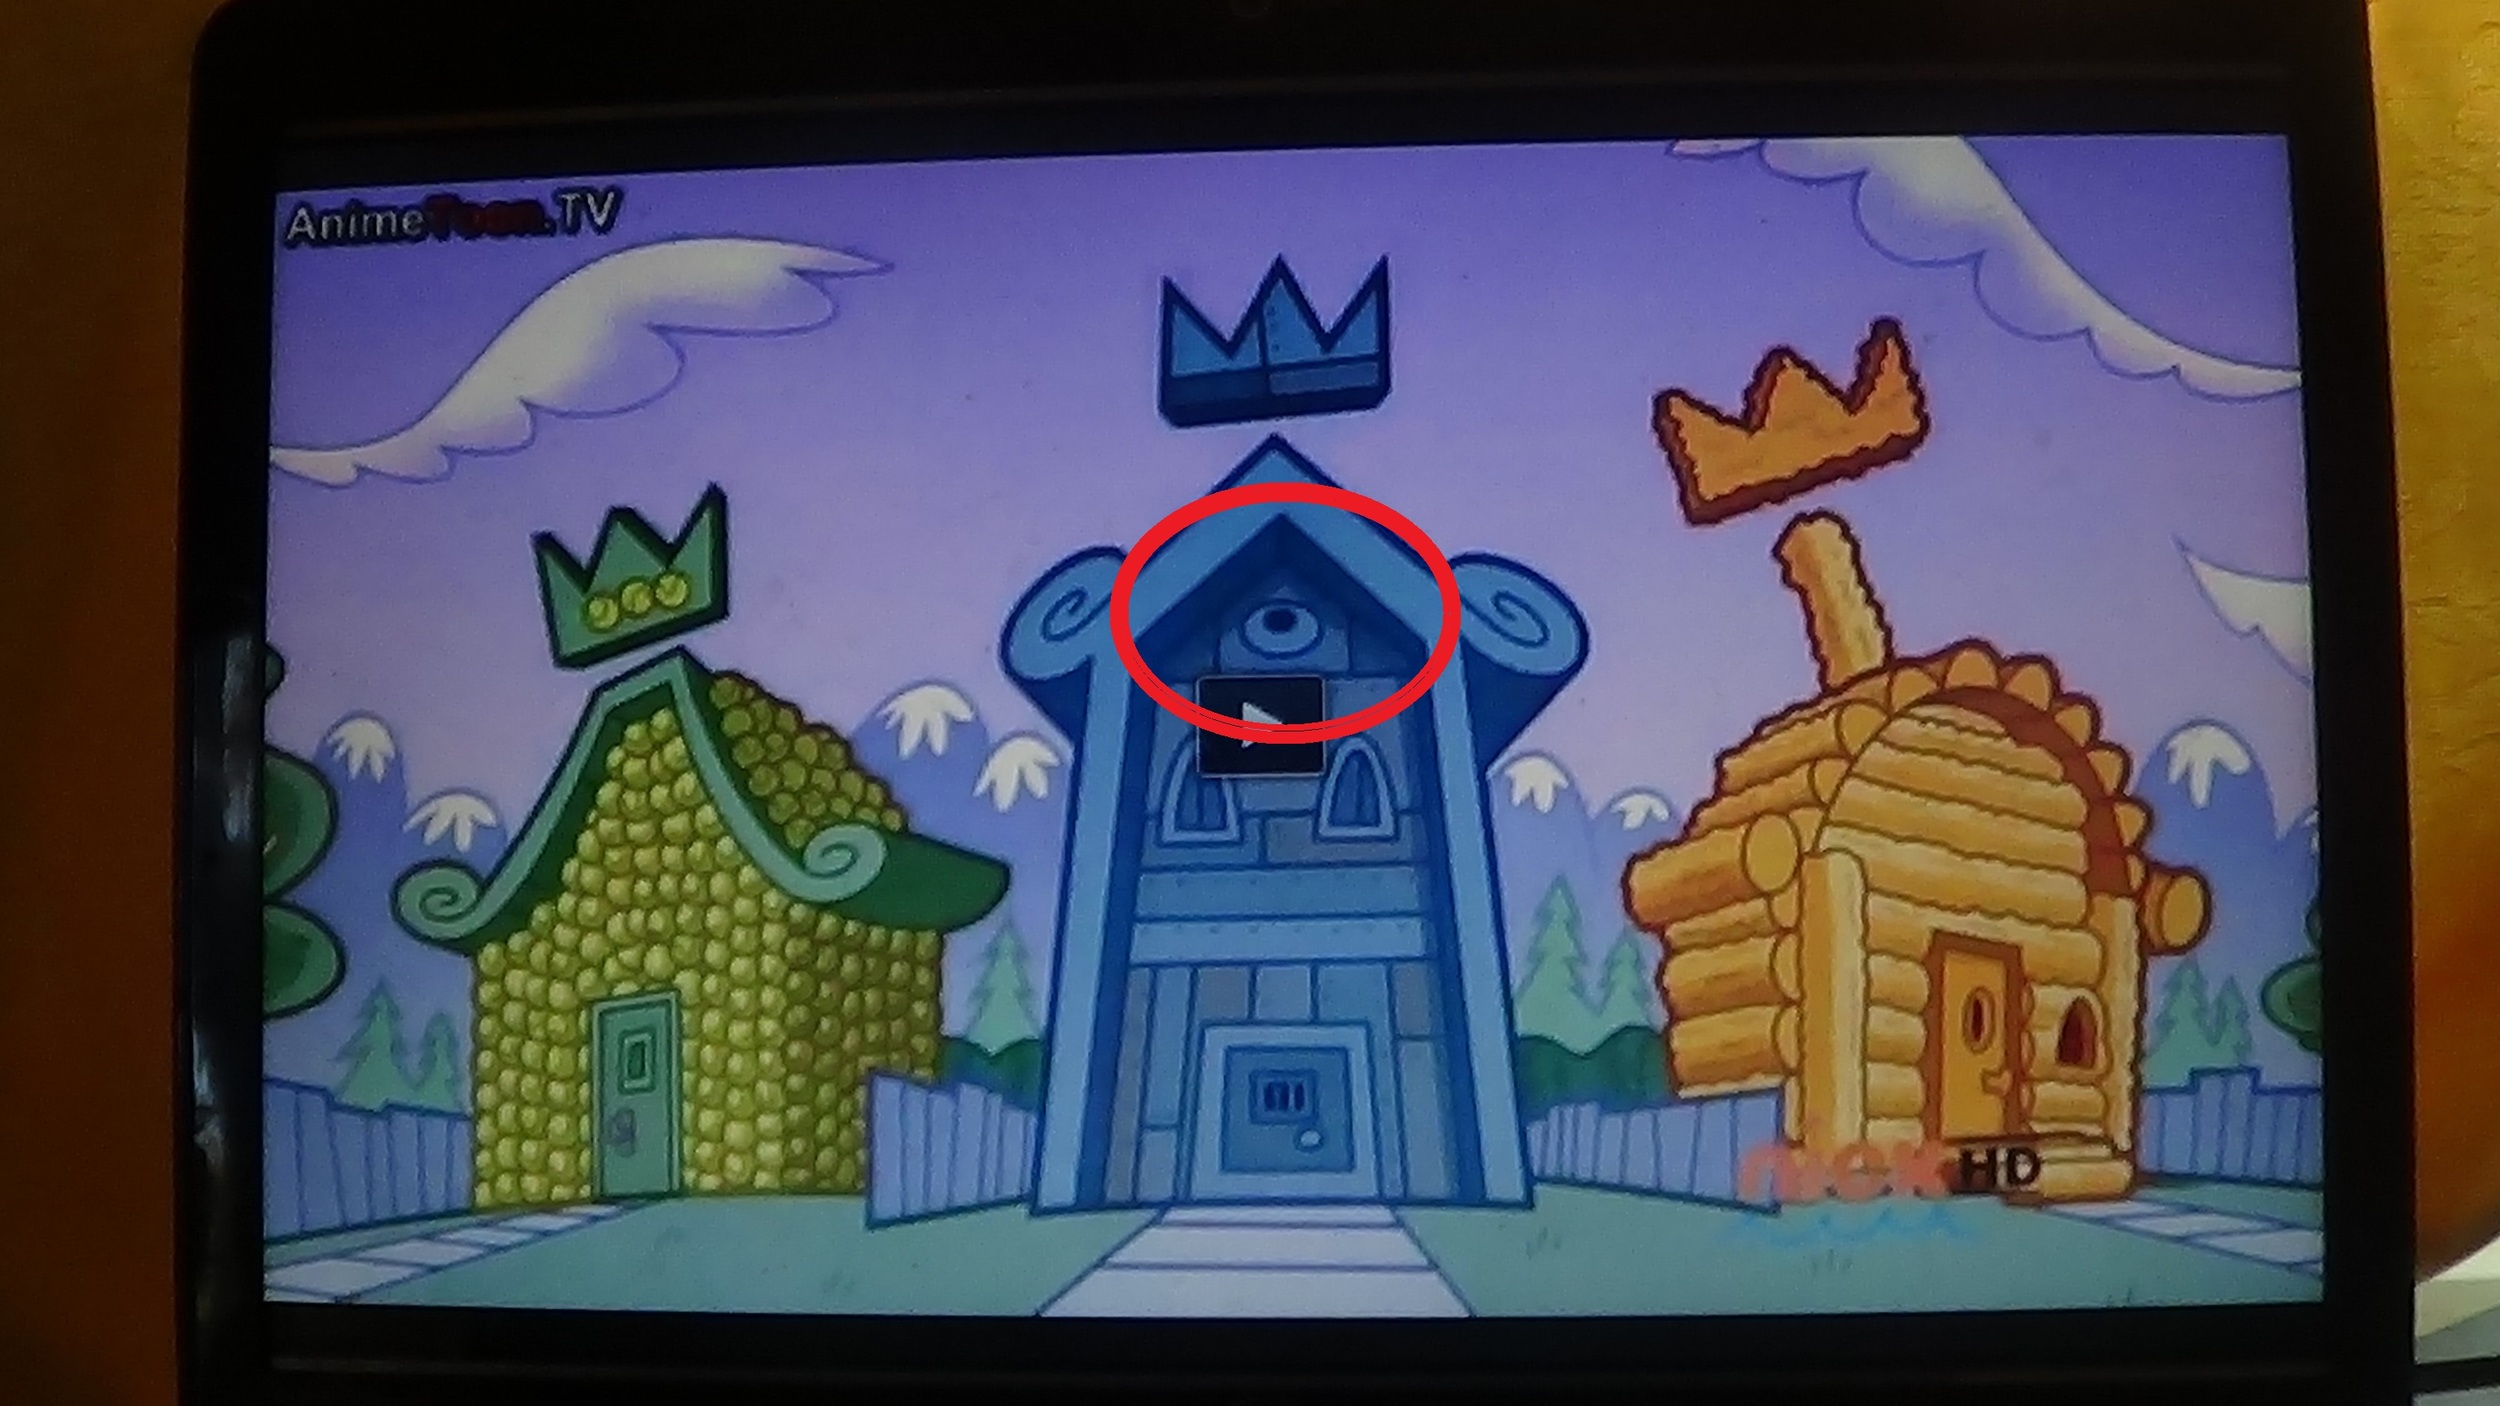 illuminati_eye_in_fairly_odd_parents_by_catpuck-d81w1ea.jpg